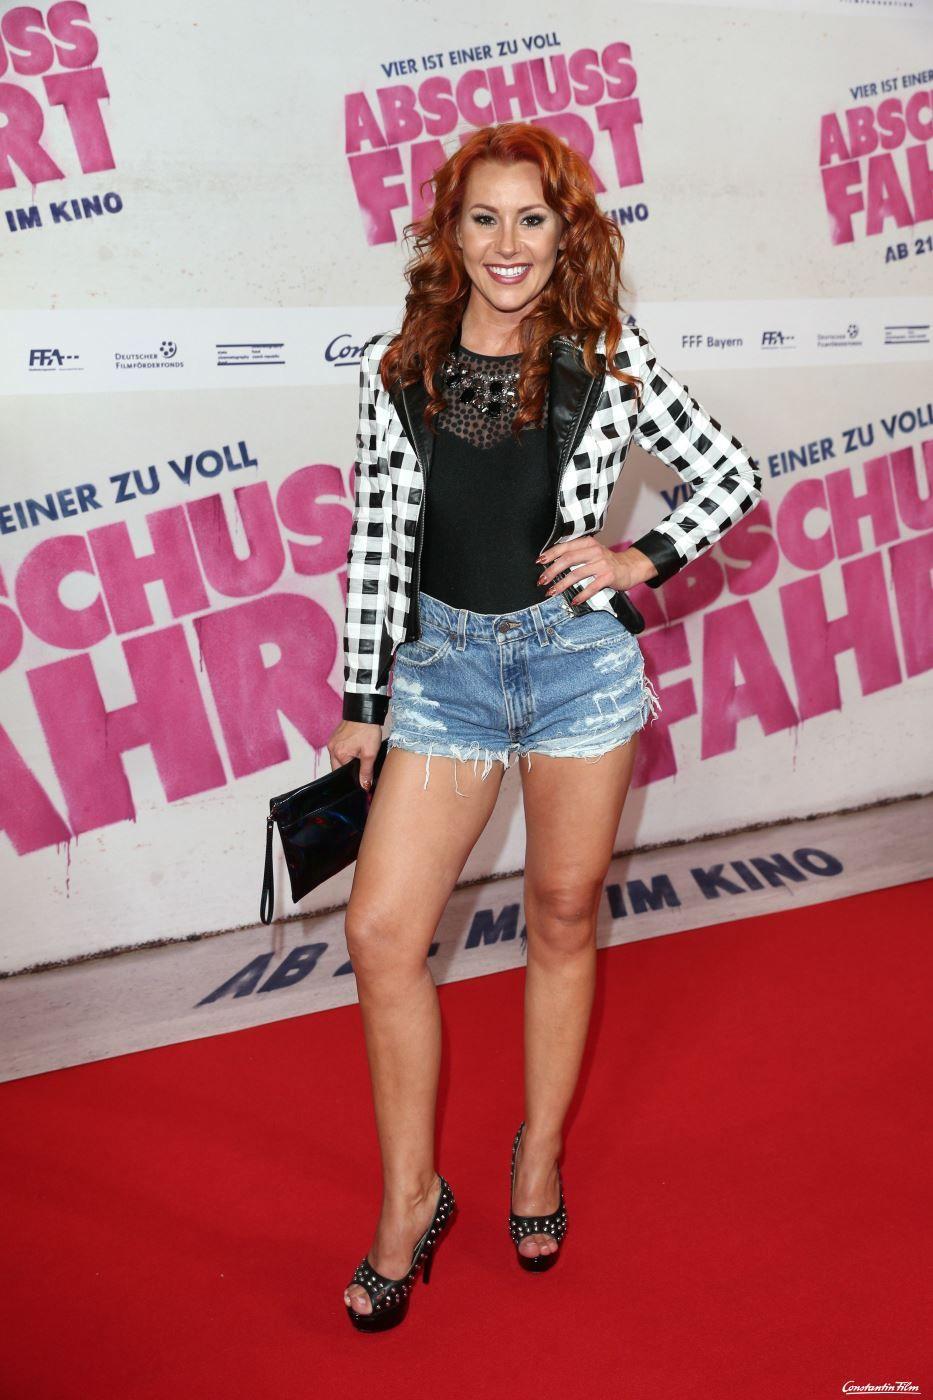 © 2015 Constantin Film Verleih GmbH / Gisela Schober  ABSCHUSSFAHRT PREMIERE am 11. Mai 2015 in München  Tiger Kirchharz